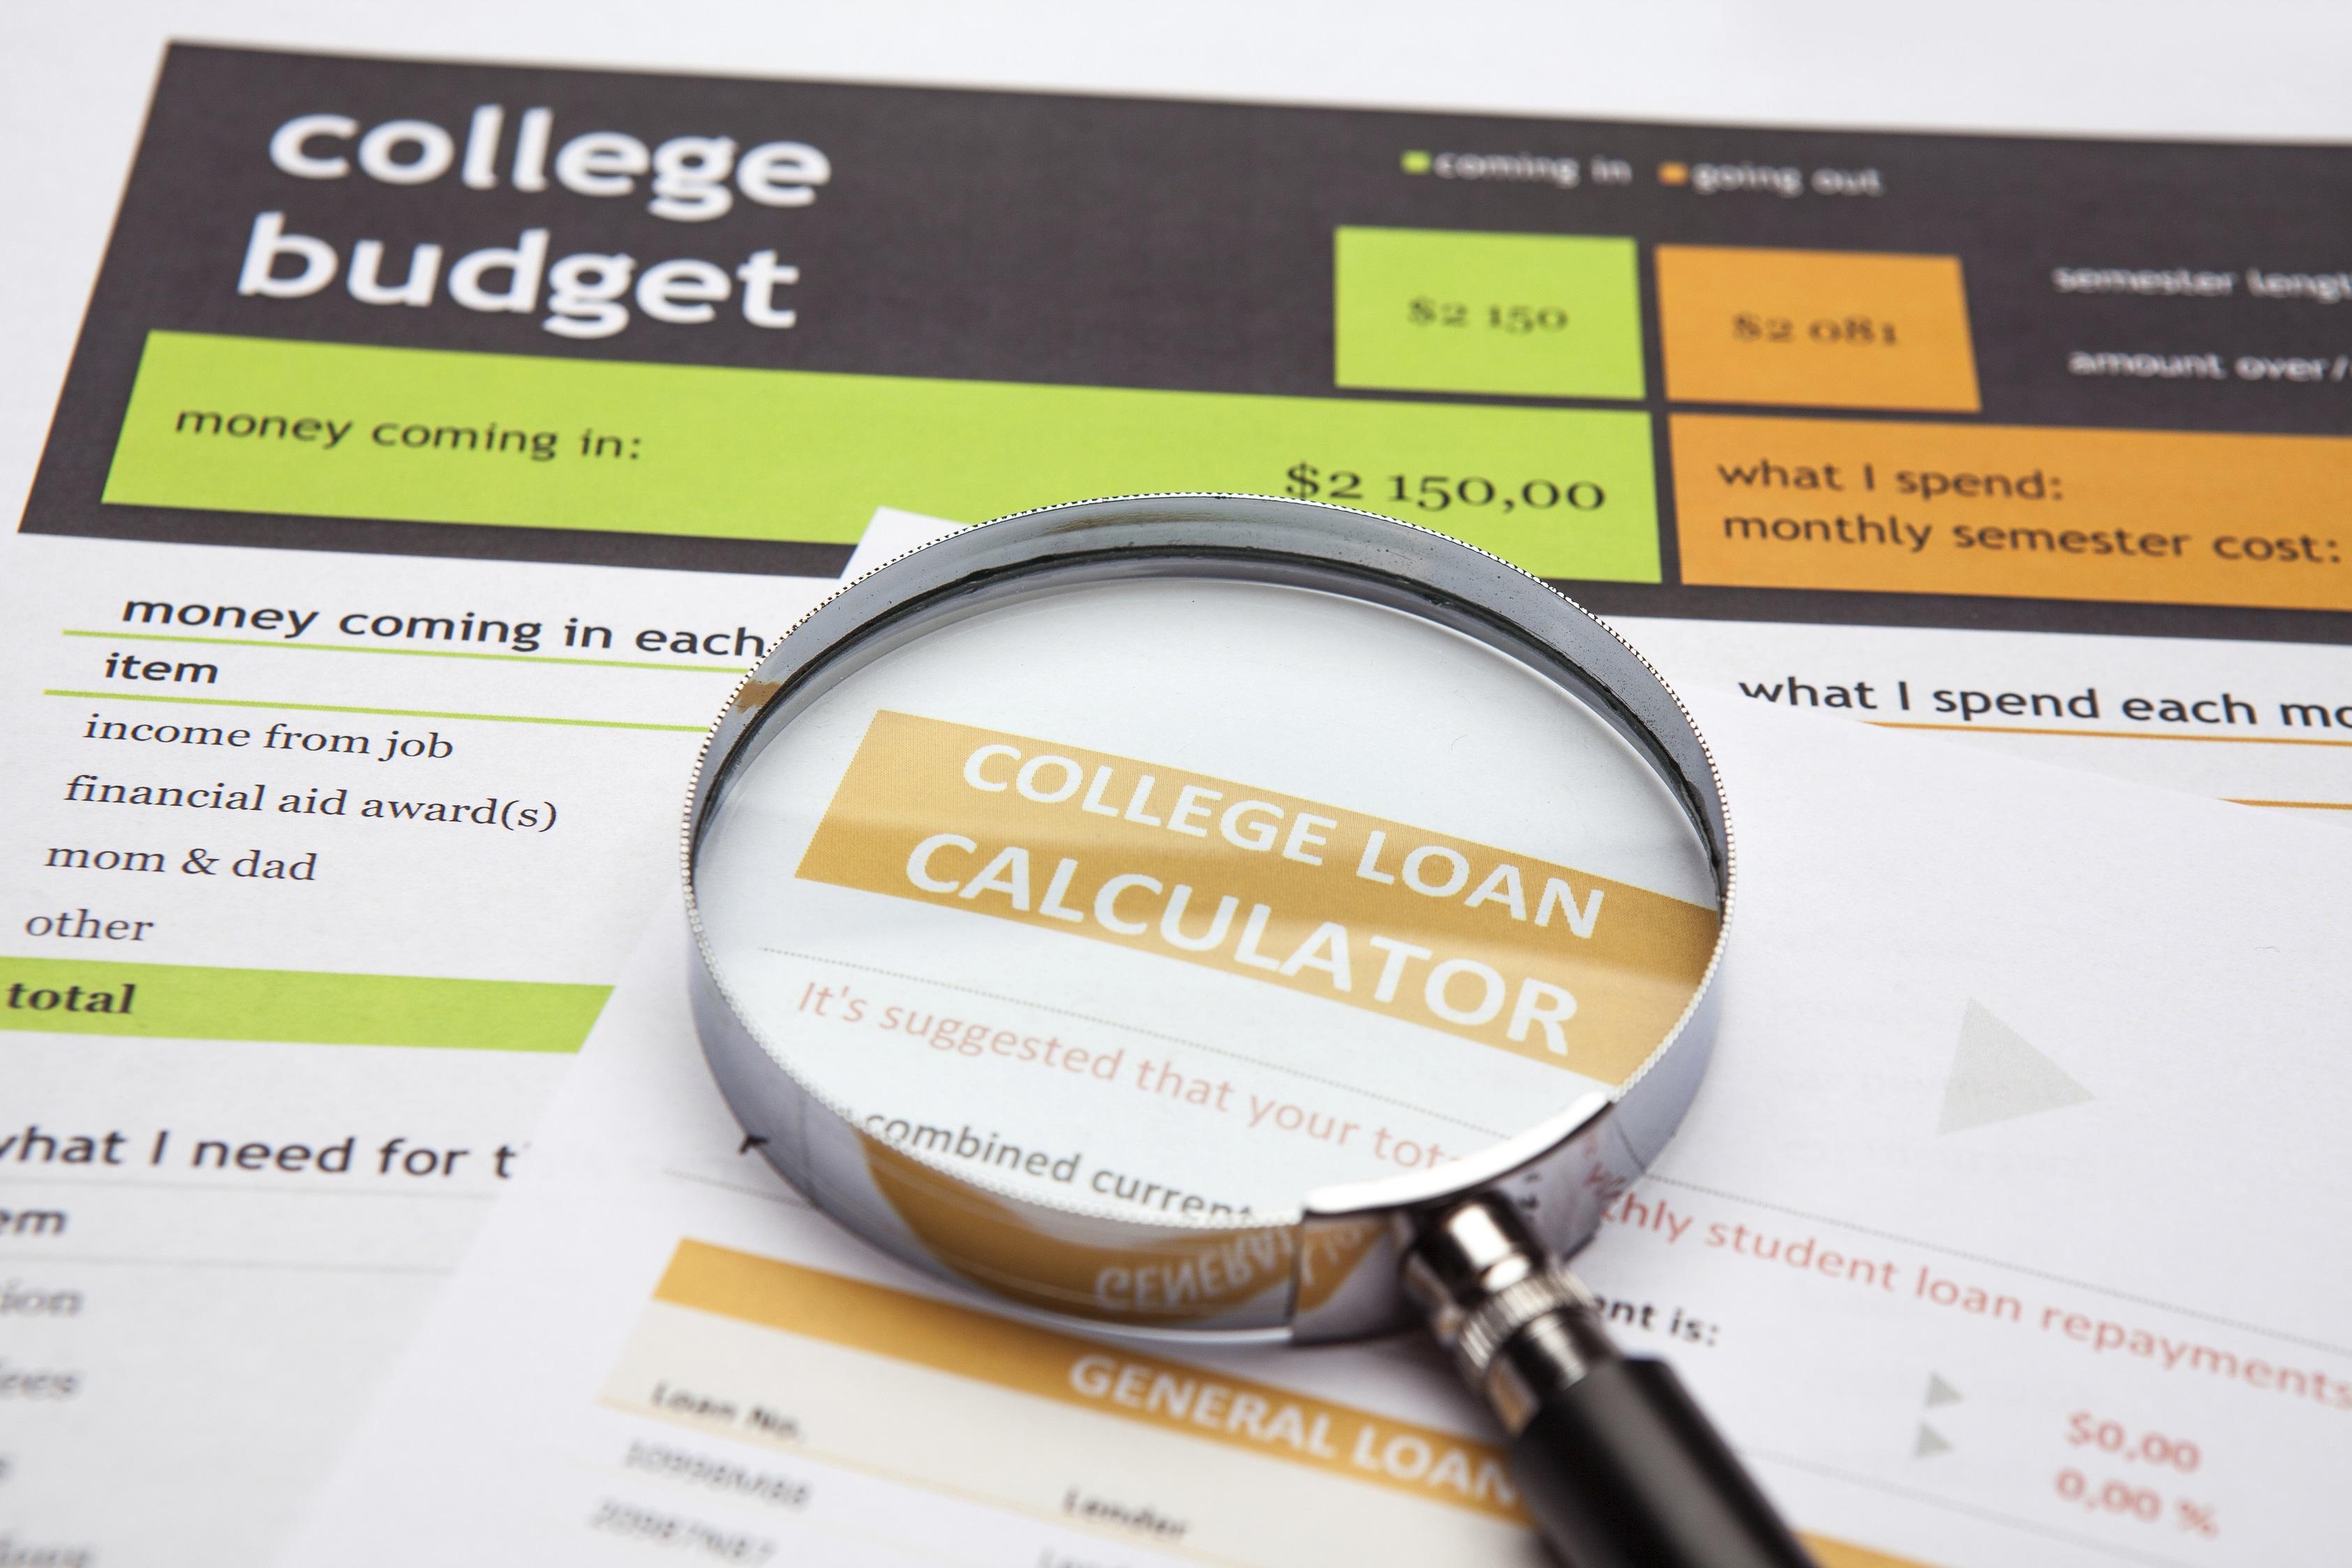 College Budget Paperwork